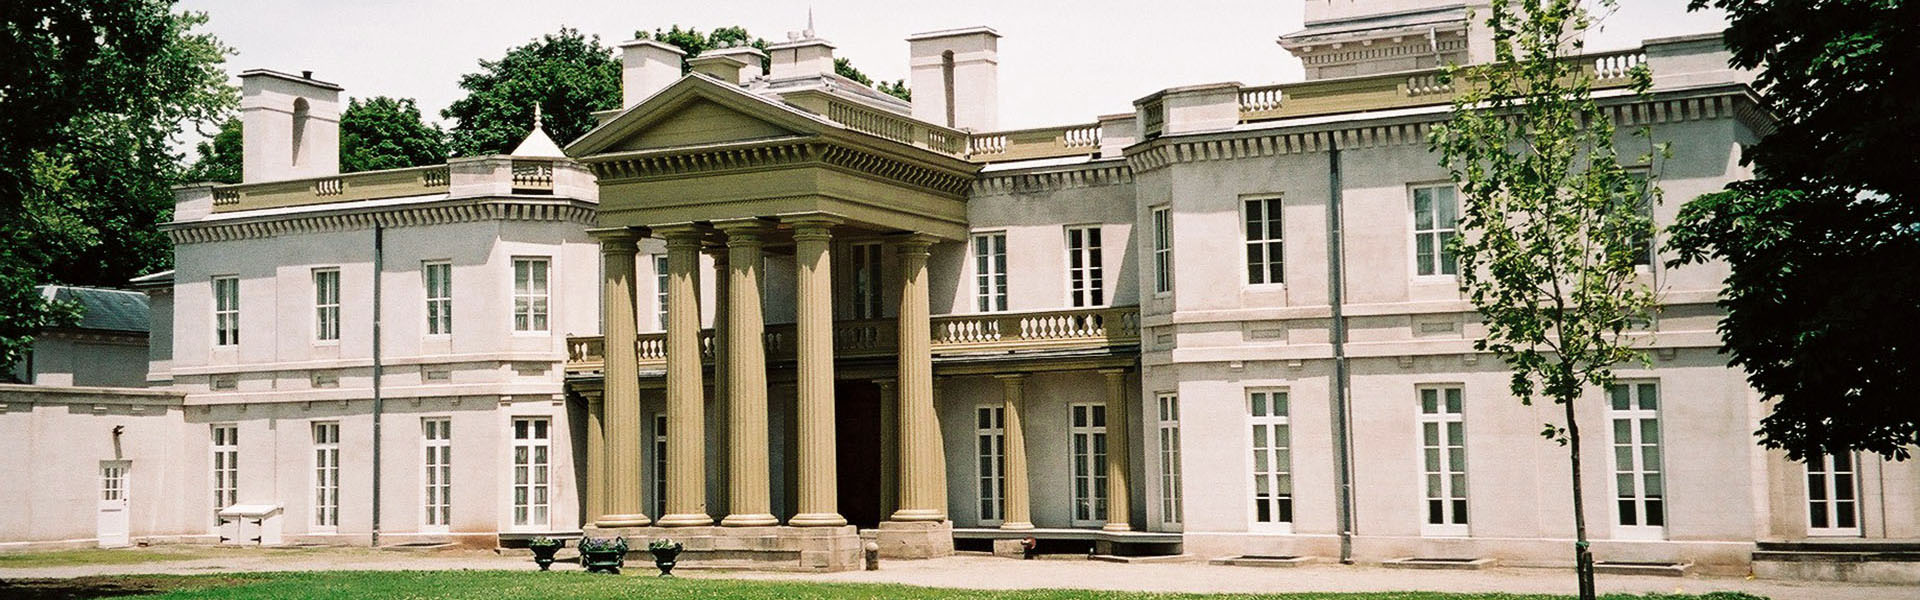 Dundurn Castle, Hamilton